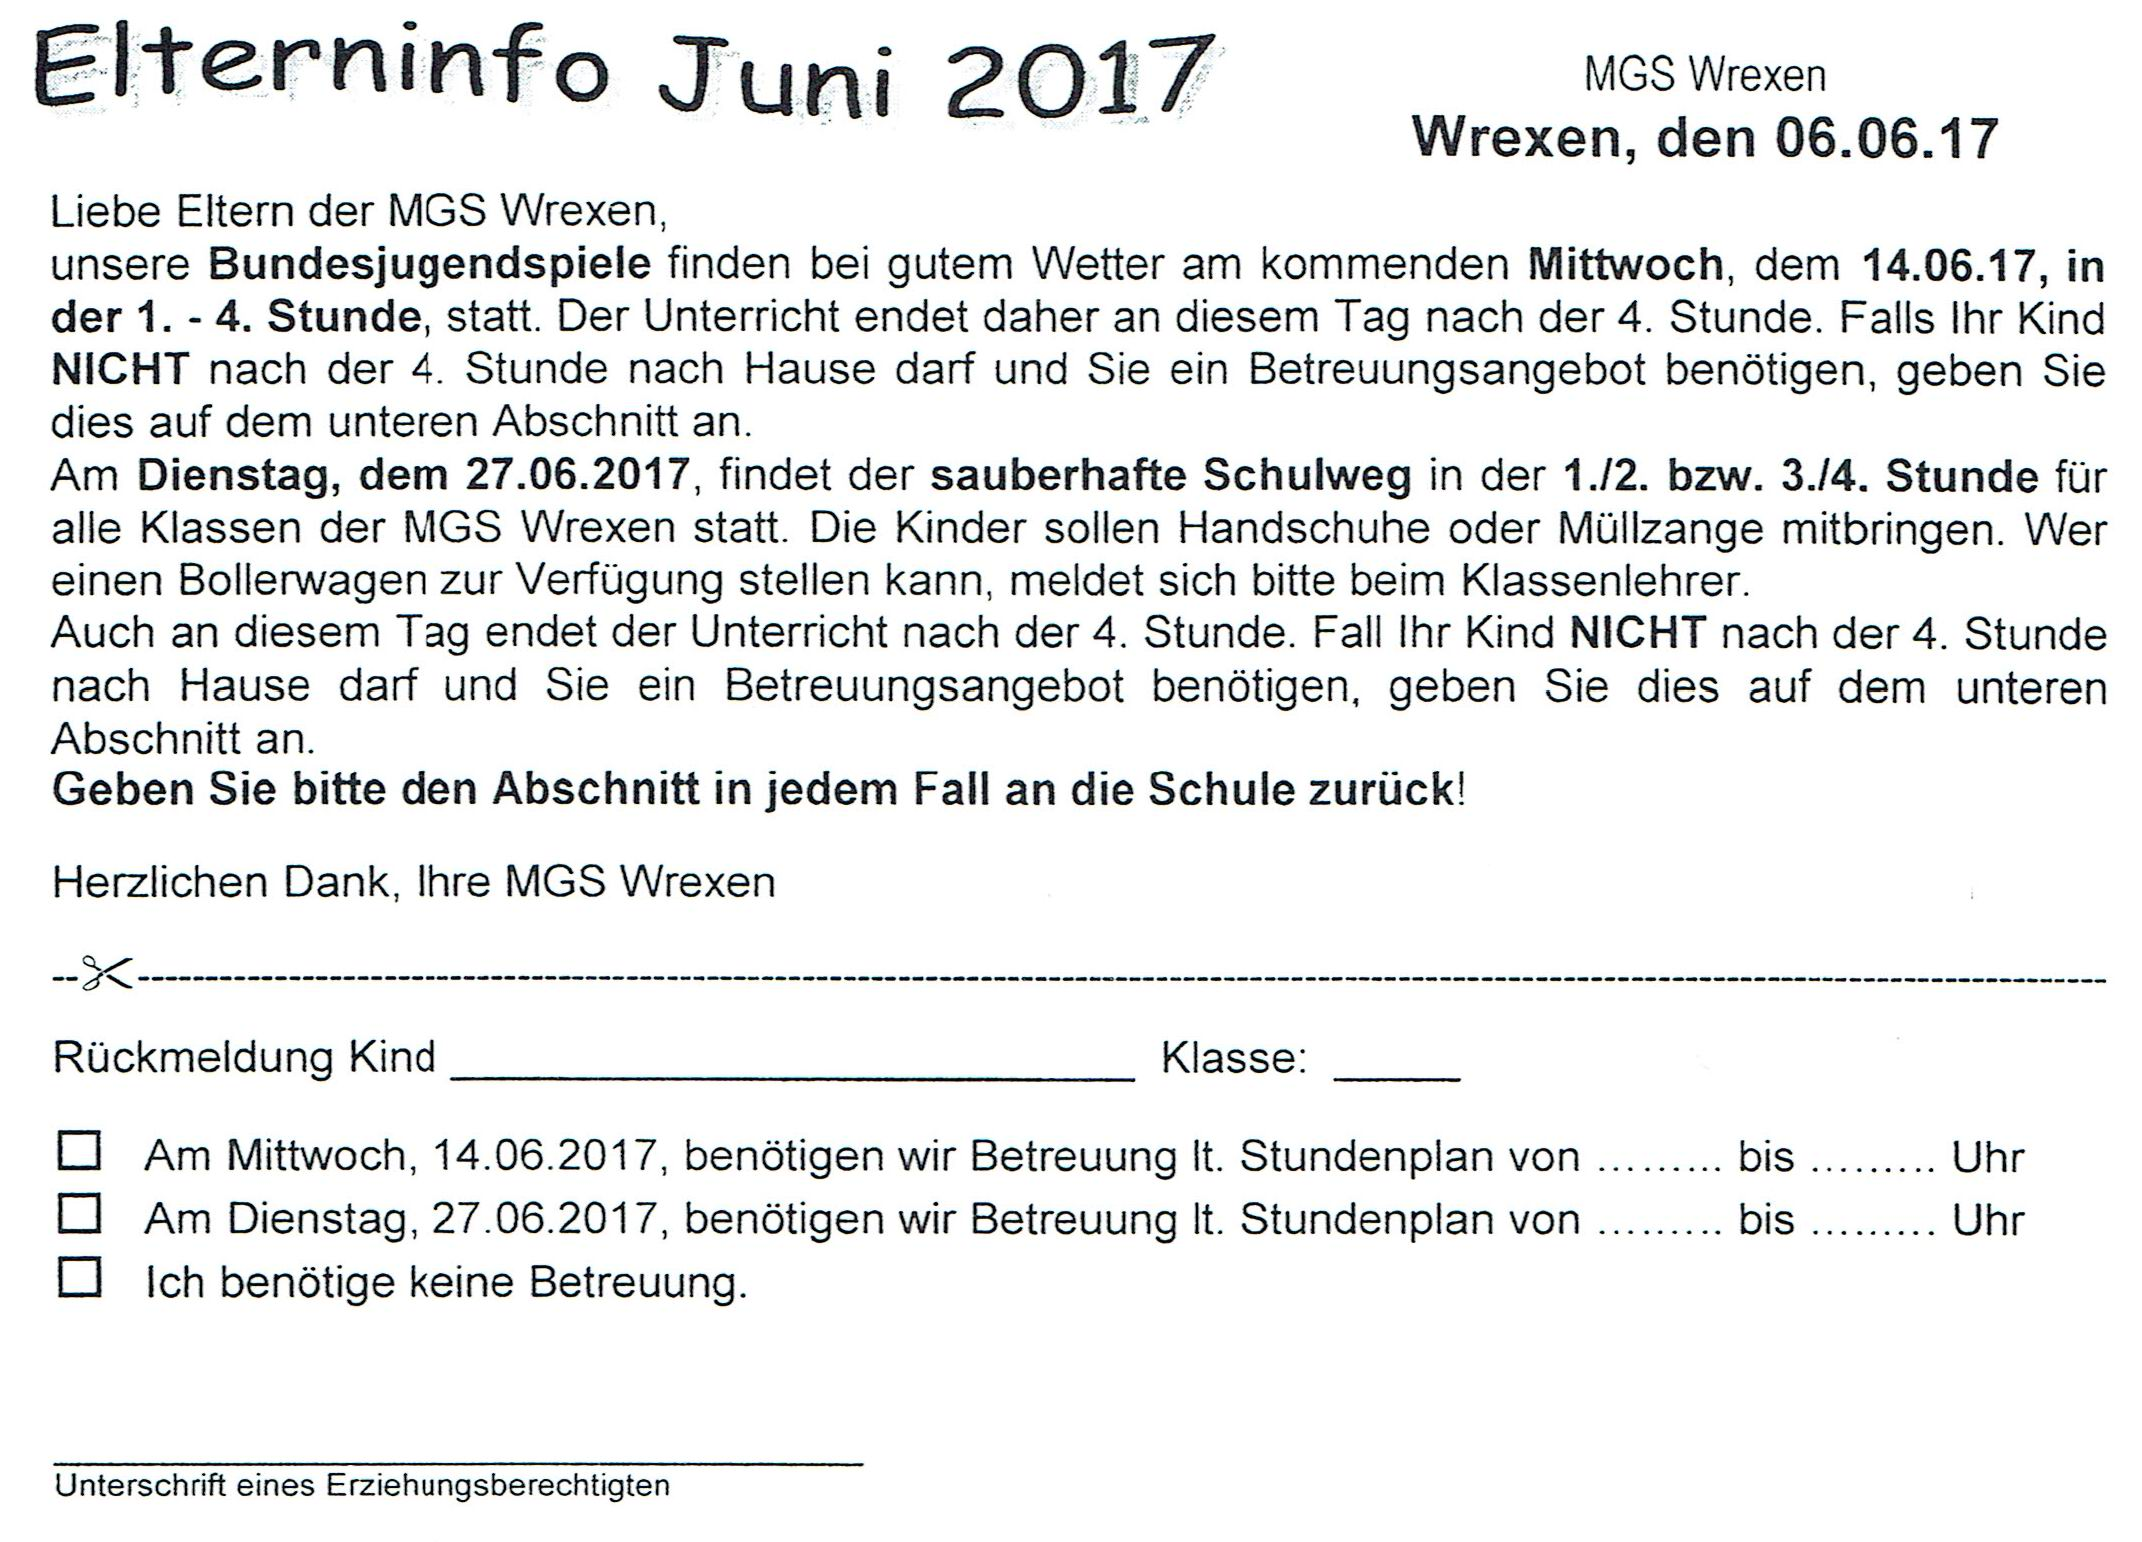 17 06 06 Elterninfo Juni 2017 cut